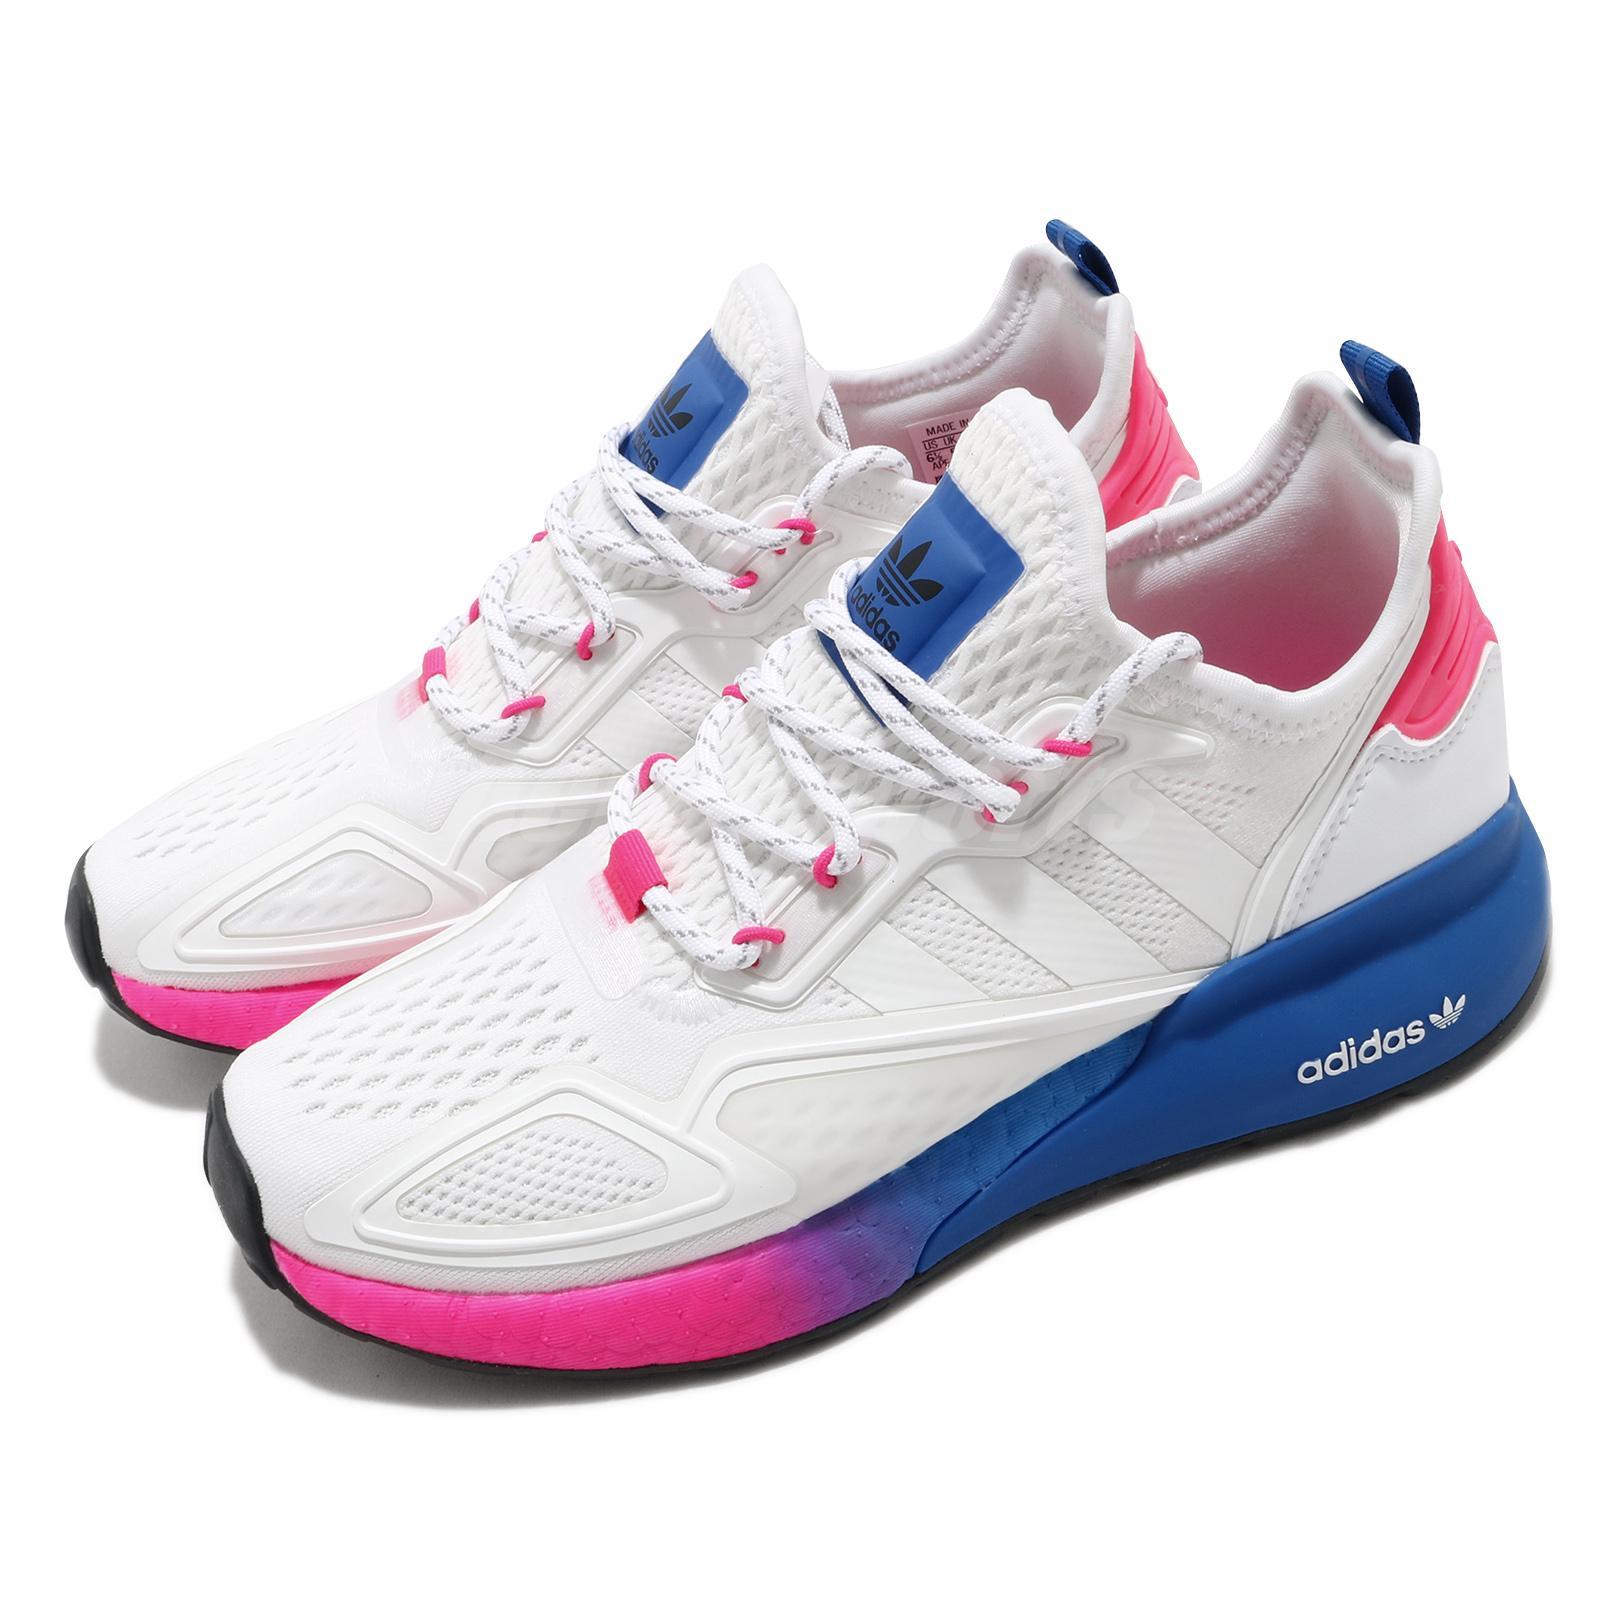 chaussure adidas zx 2k boost